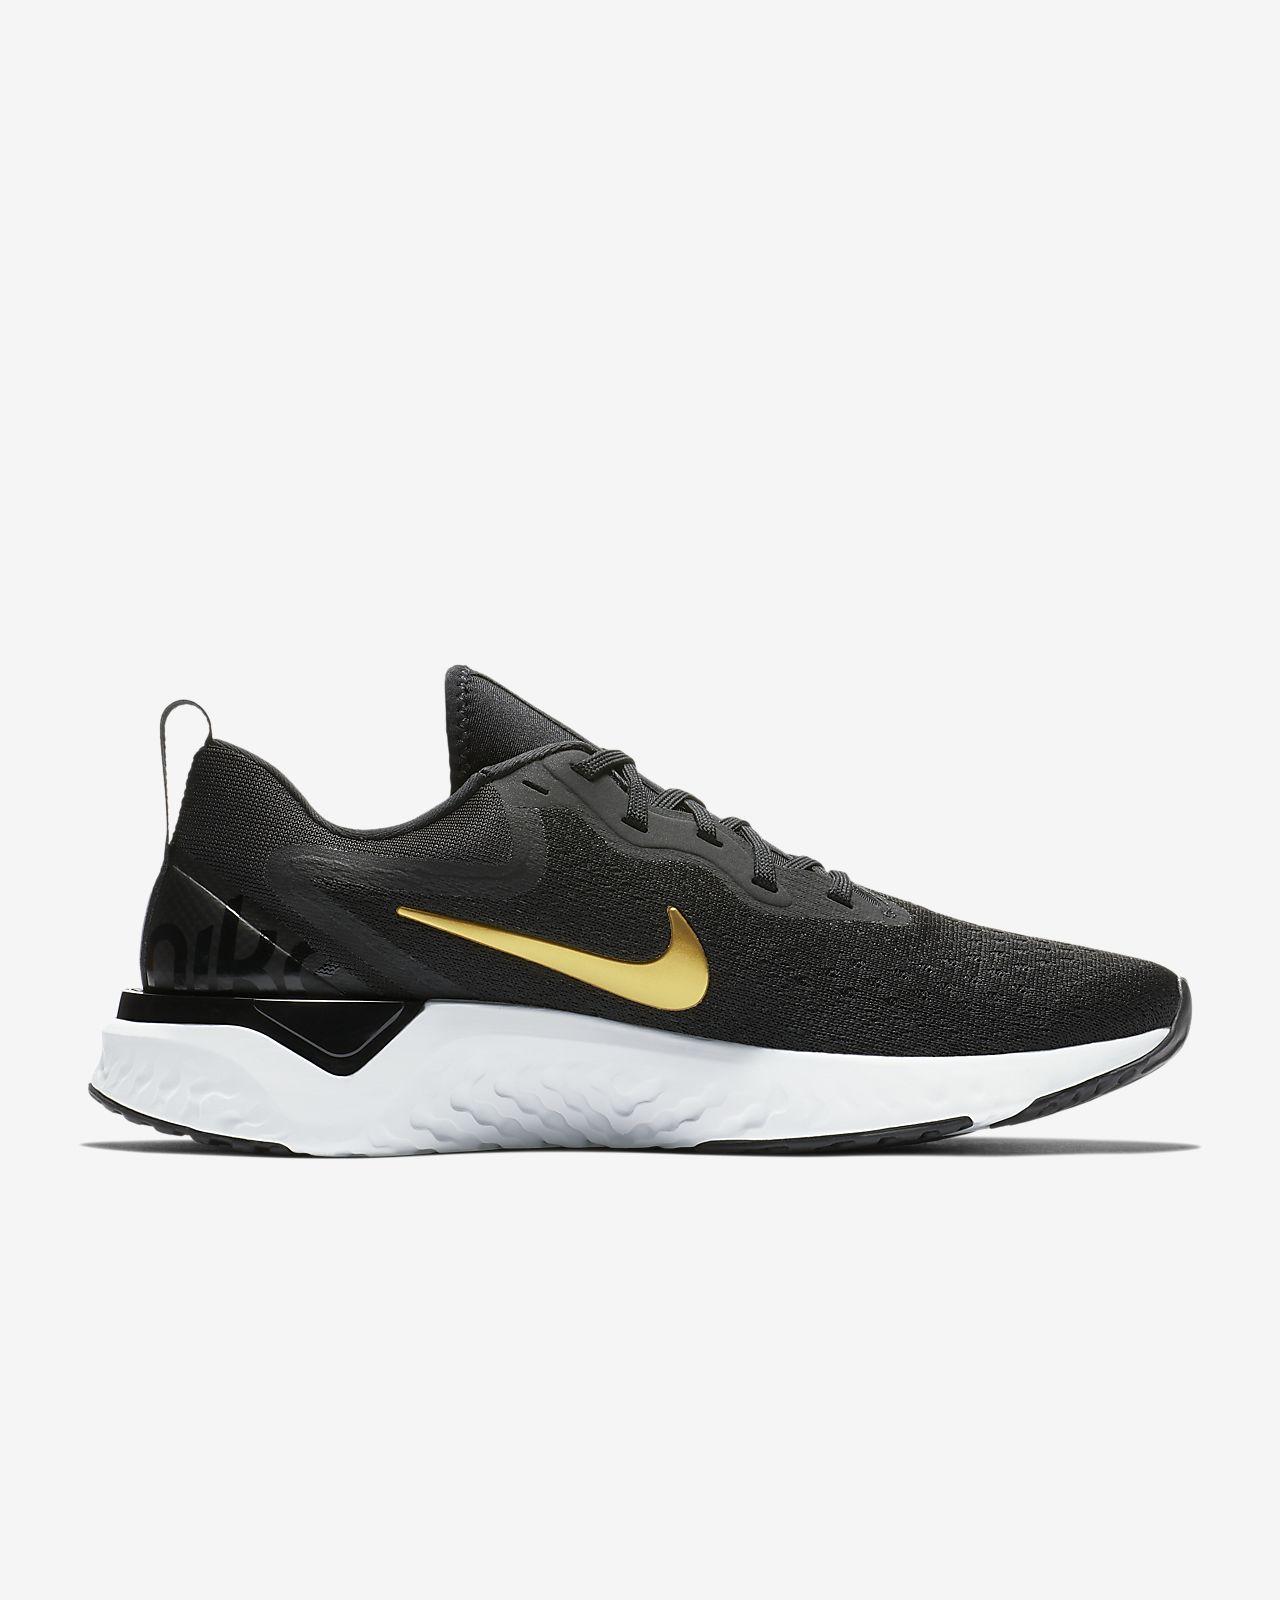 Nike Air Zoom Odyssey löparskor produkttest  Aktiv Träning